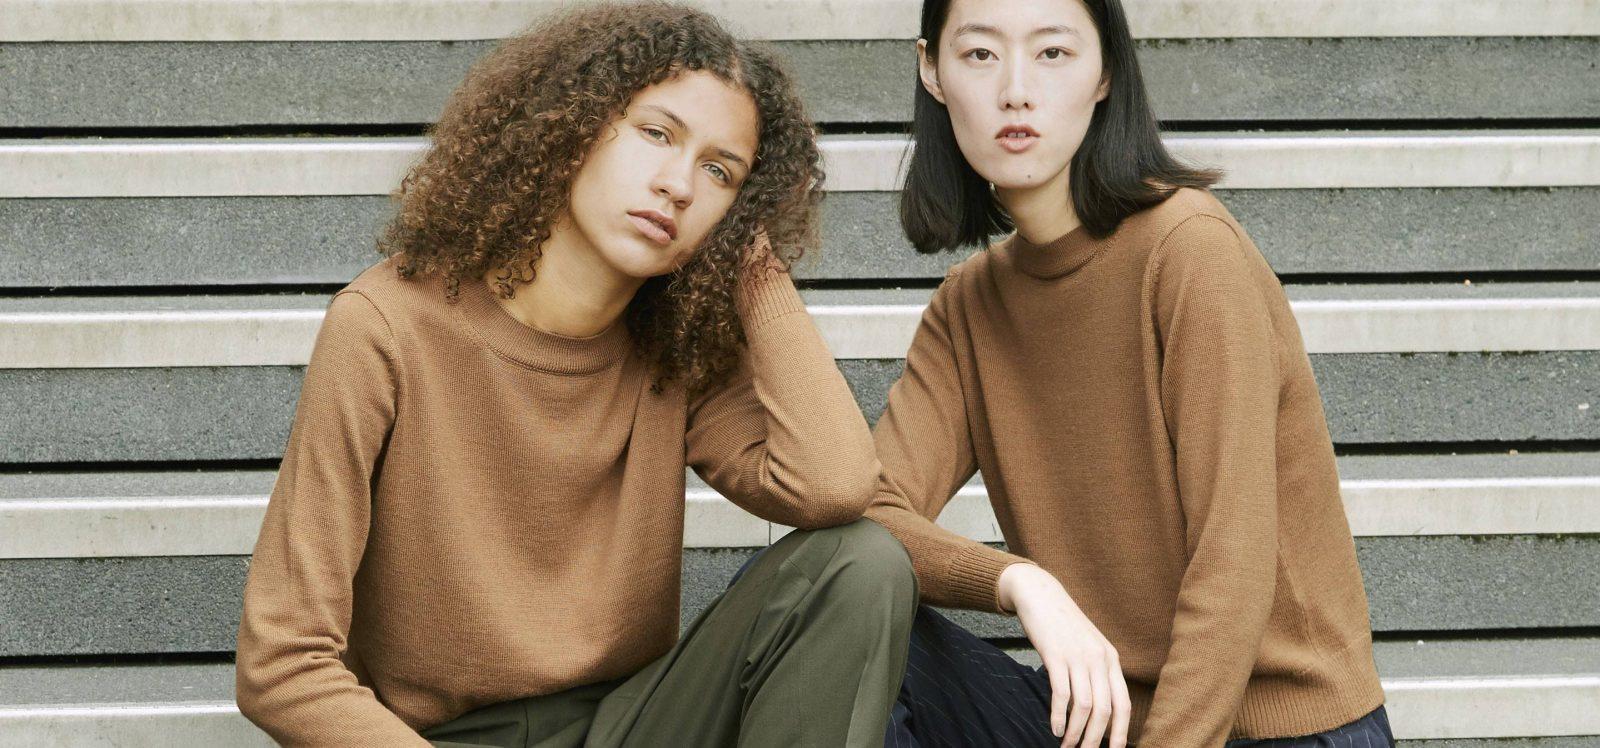 study 34 interview eleanor oneill alpaca sweater